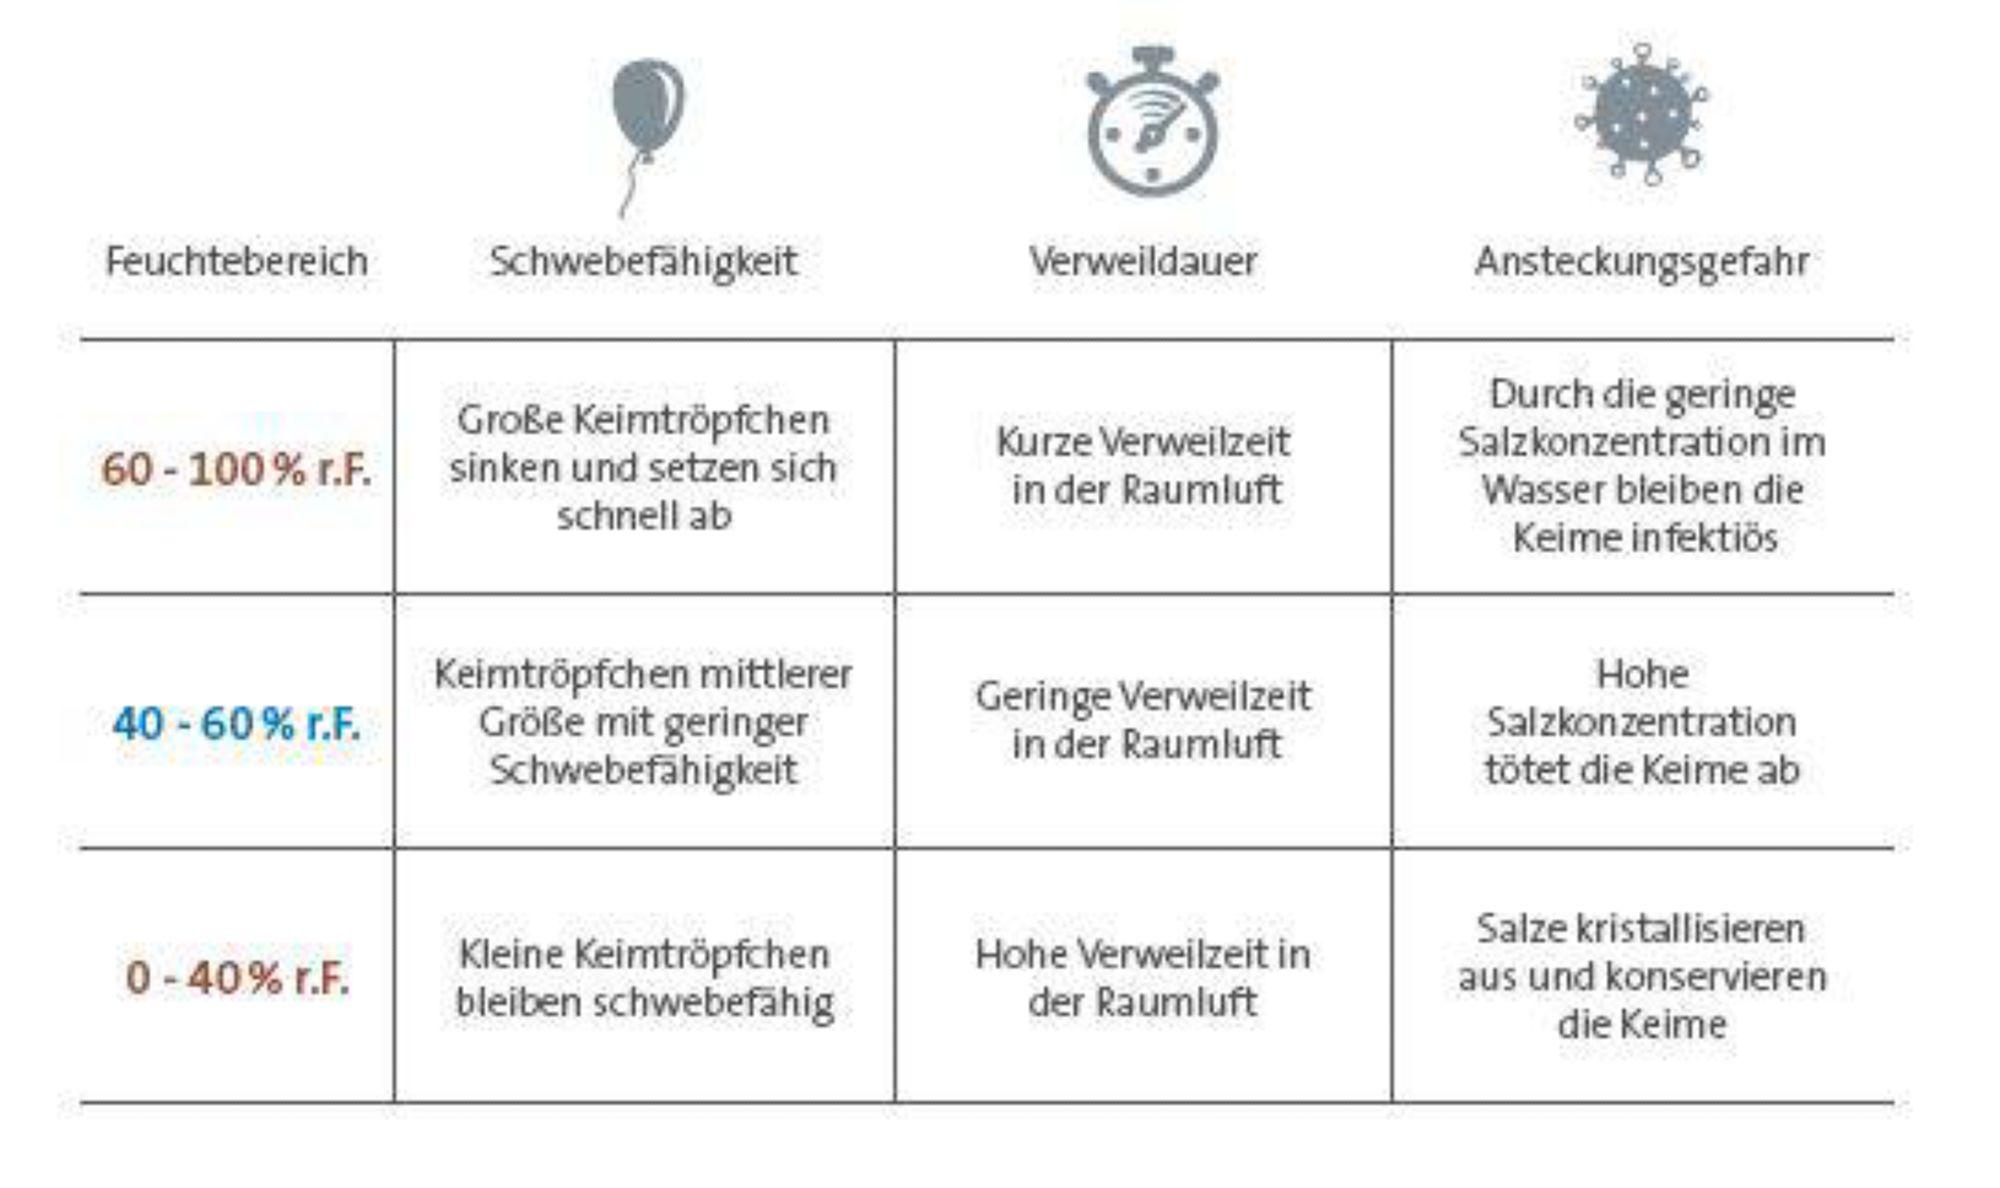 physik-der-keimtroepfchen-tabelle-condair-gmbh.JPG